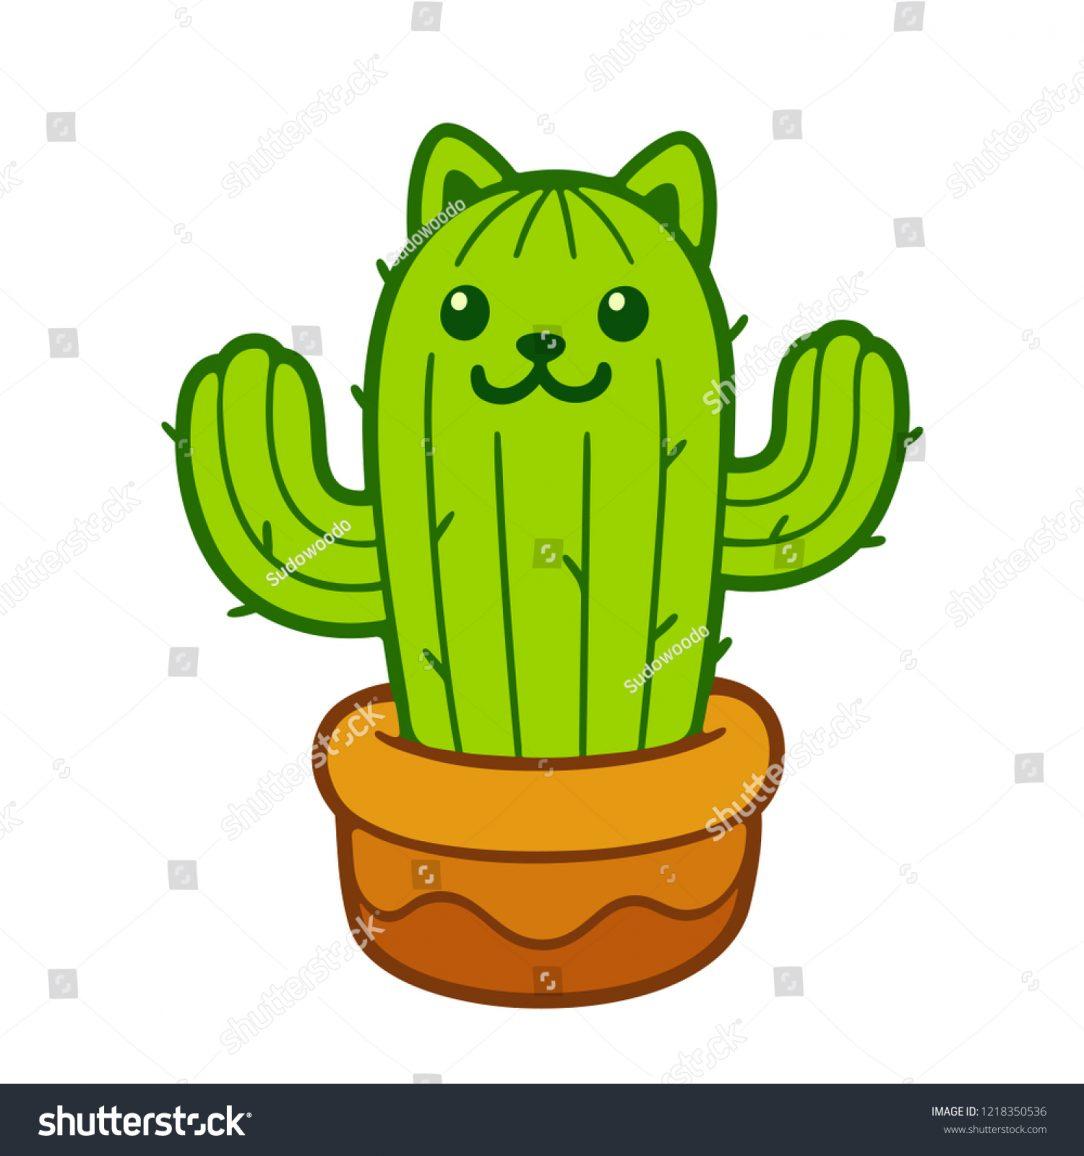 1084x1156 Adorable Dog Drawings Animal Cartoon Cutest Bff